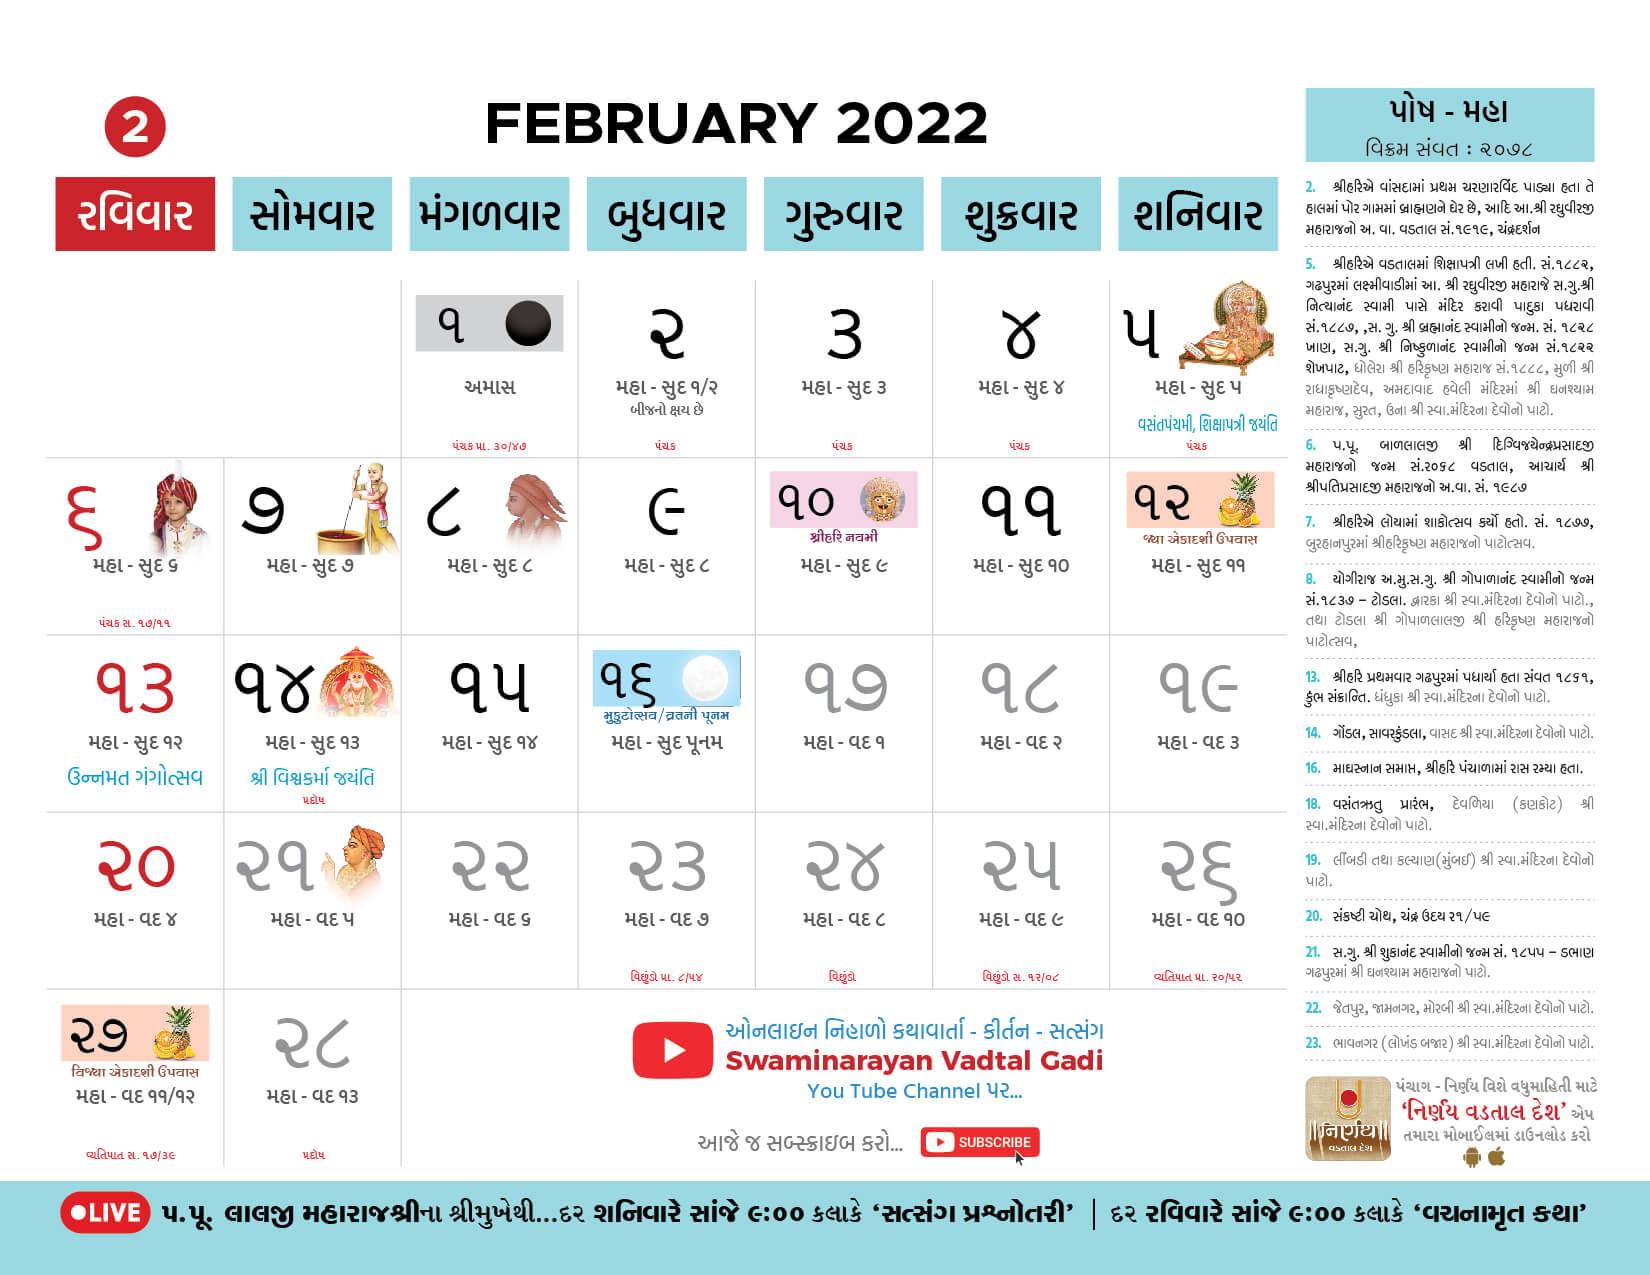 Feb 2022